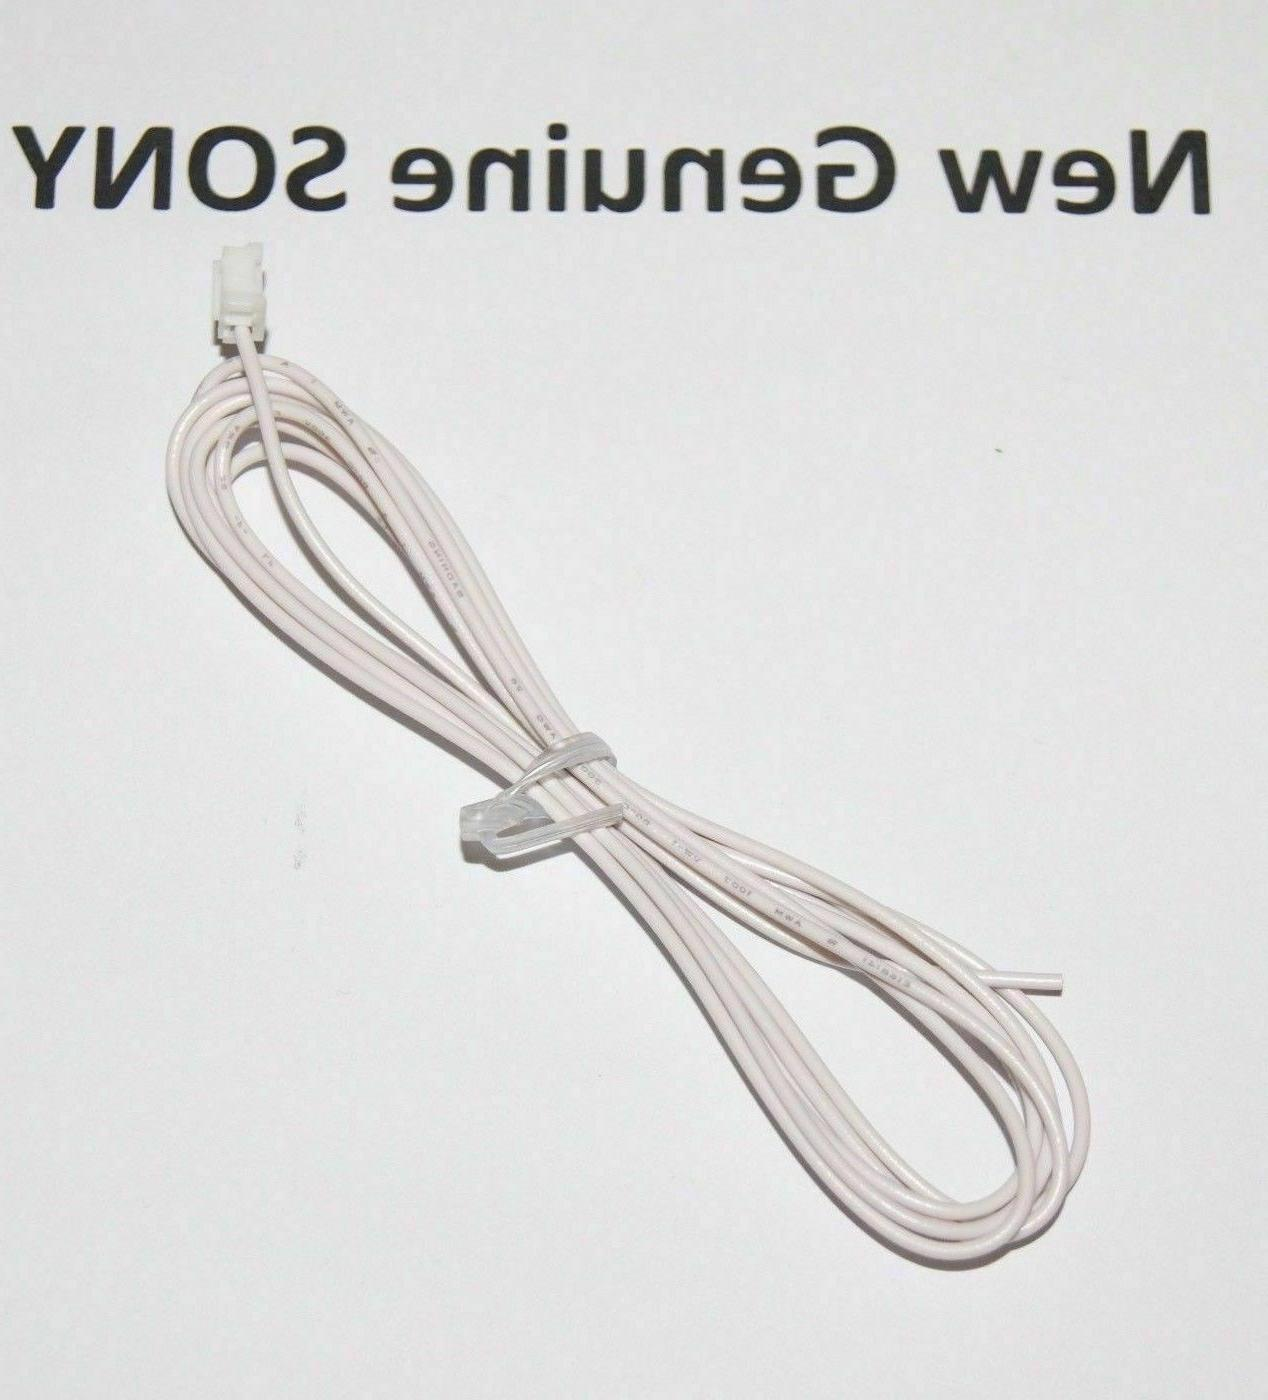 genuine fm antenna for str dh190 str